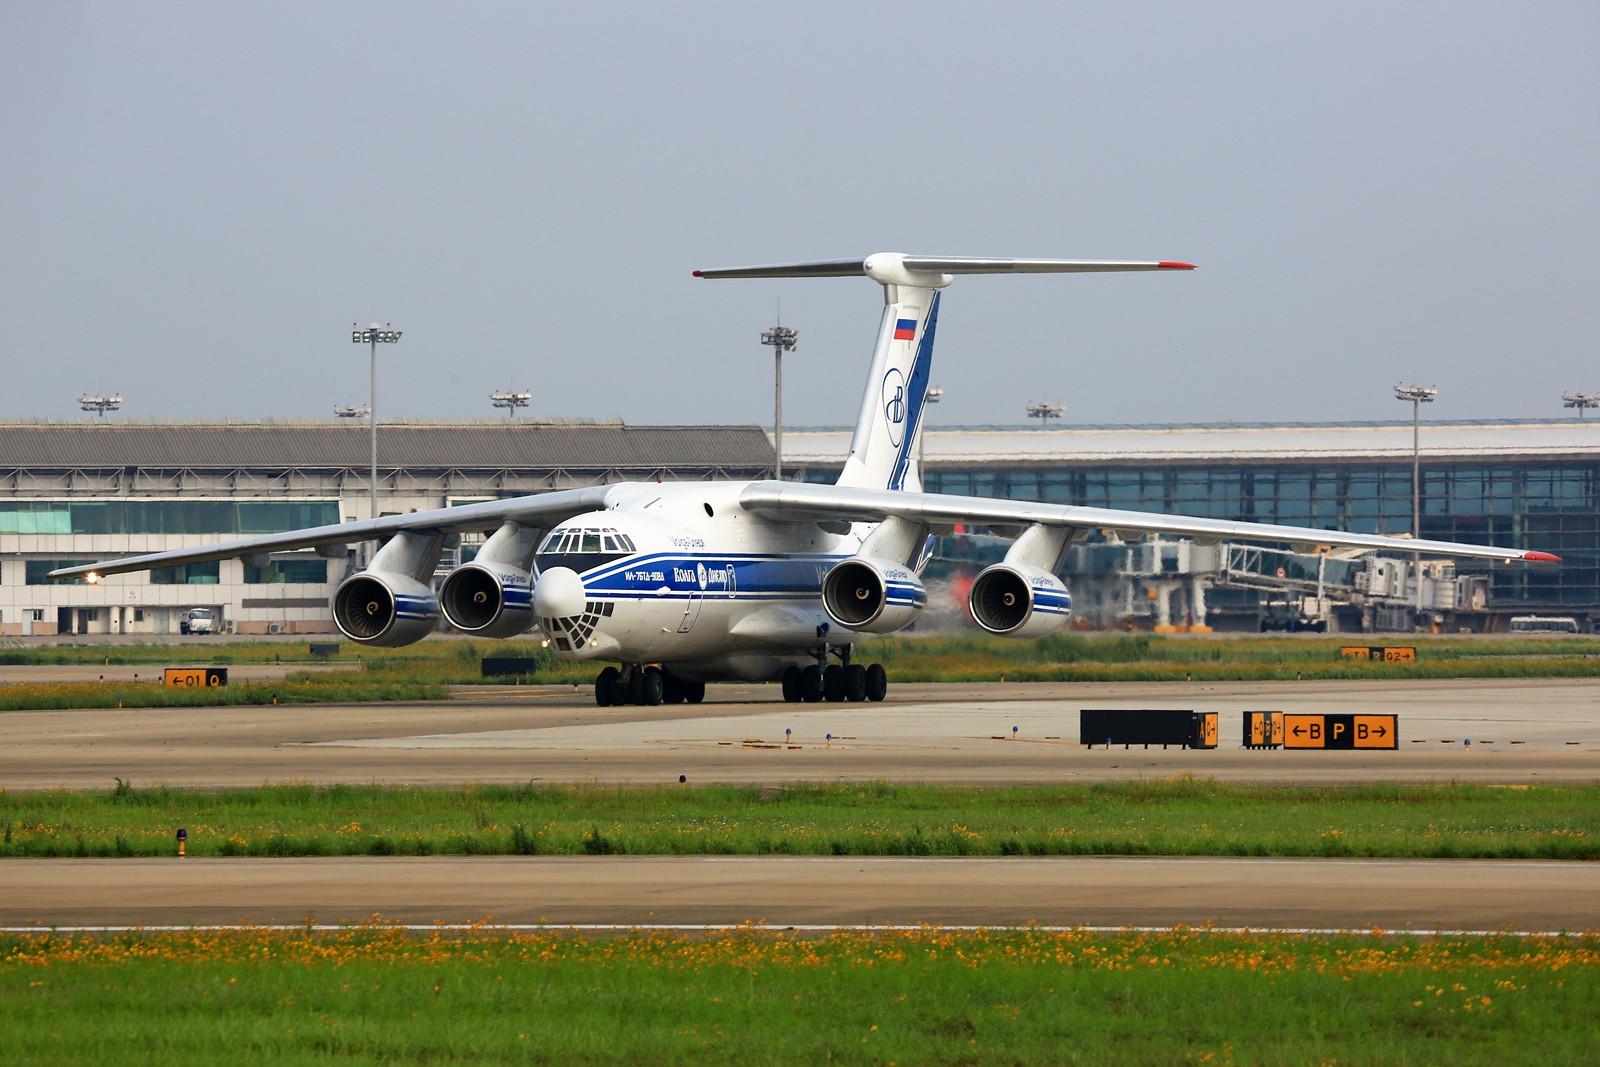 Re:[原创]【NKG】******小公园一天蹲到俩毛子:奥伦堡772+伏尔加第聂伯IL-76TD****** ILYUSHIN IL-76-TD-90VD RA-76503 中国南京禄口国际机场